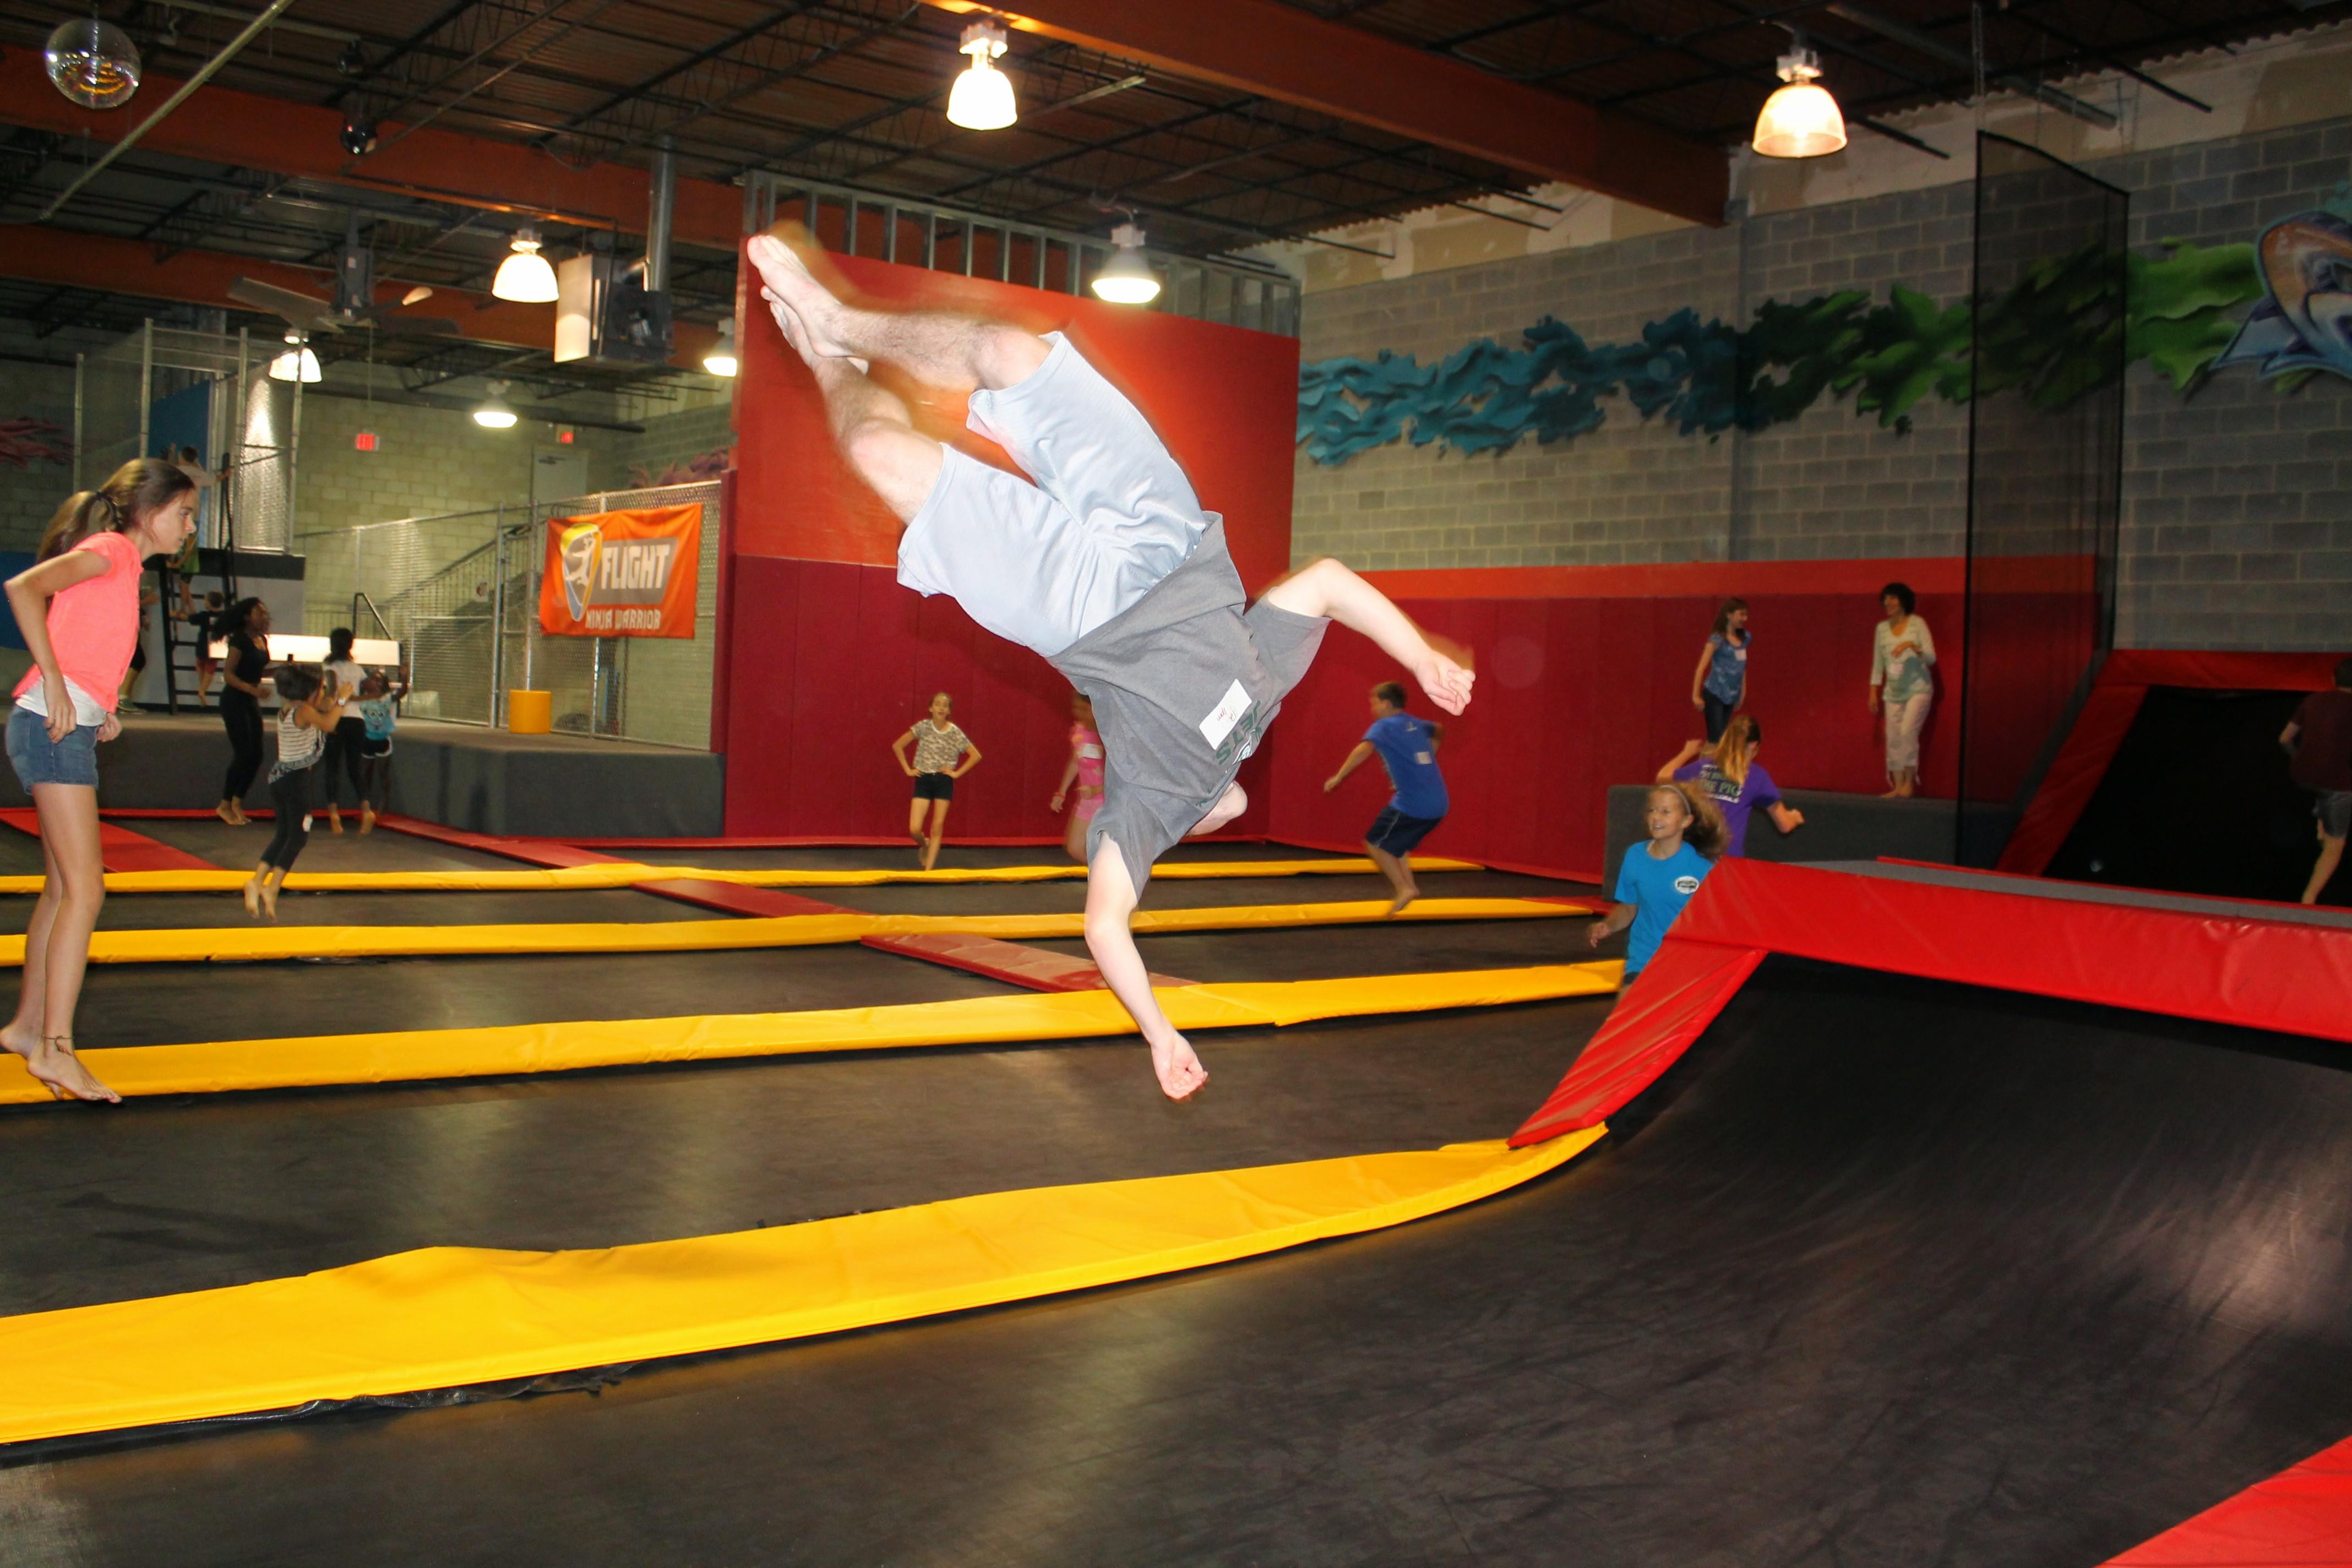 Flight Fit n Fun opens new trampoline park in Sterling VA Summer 2016